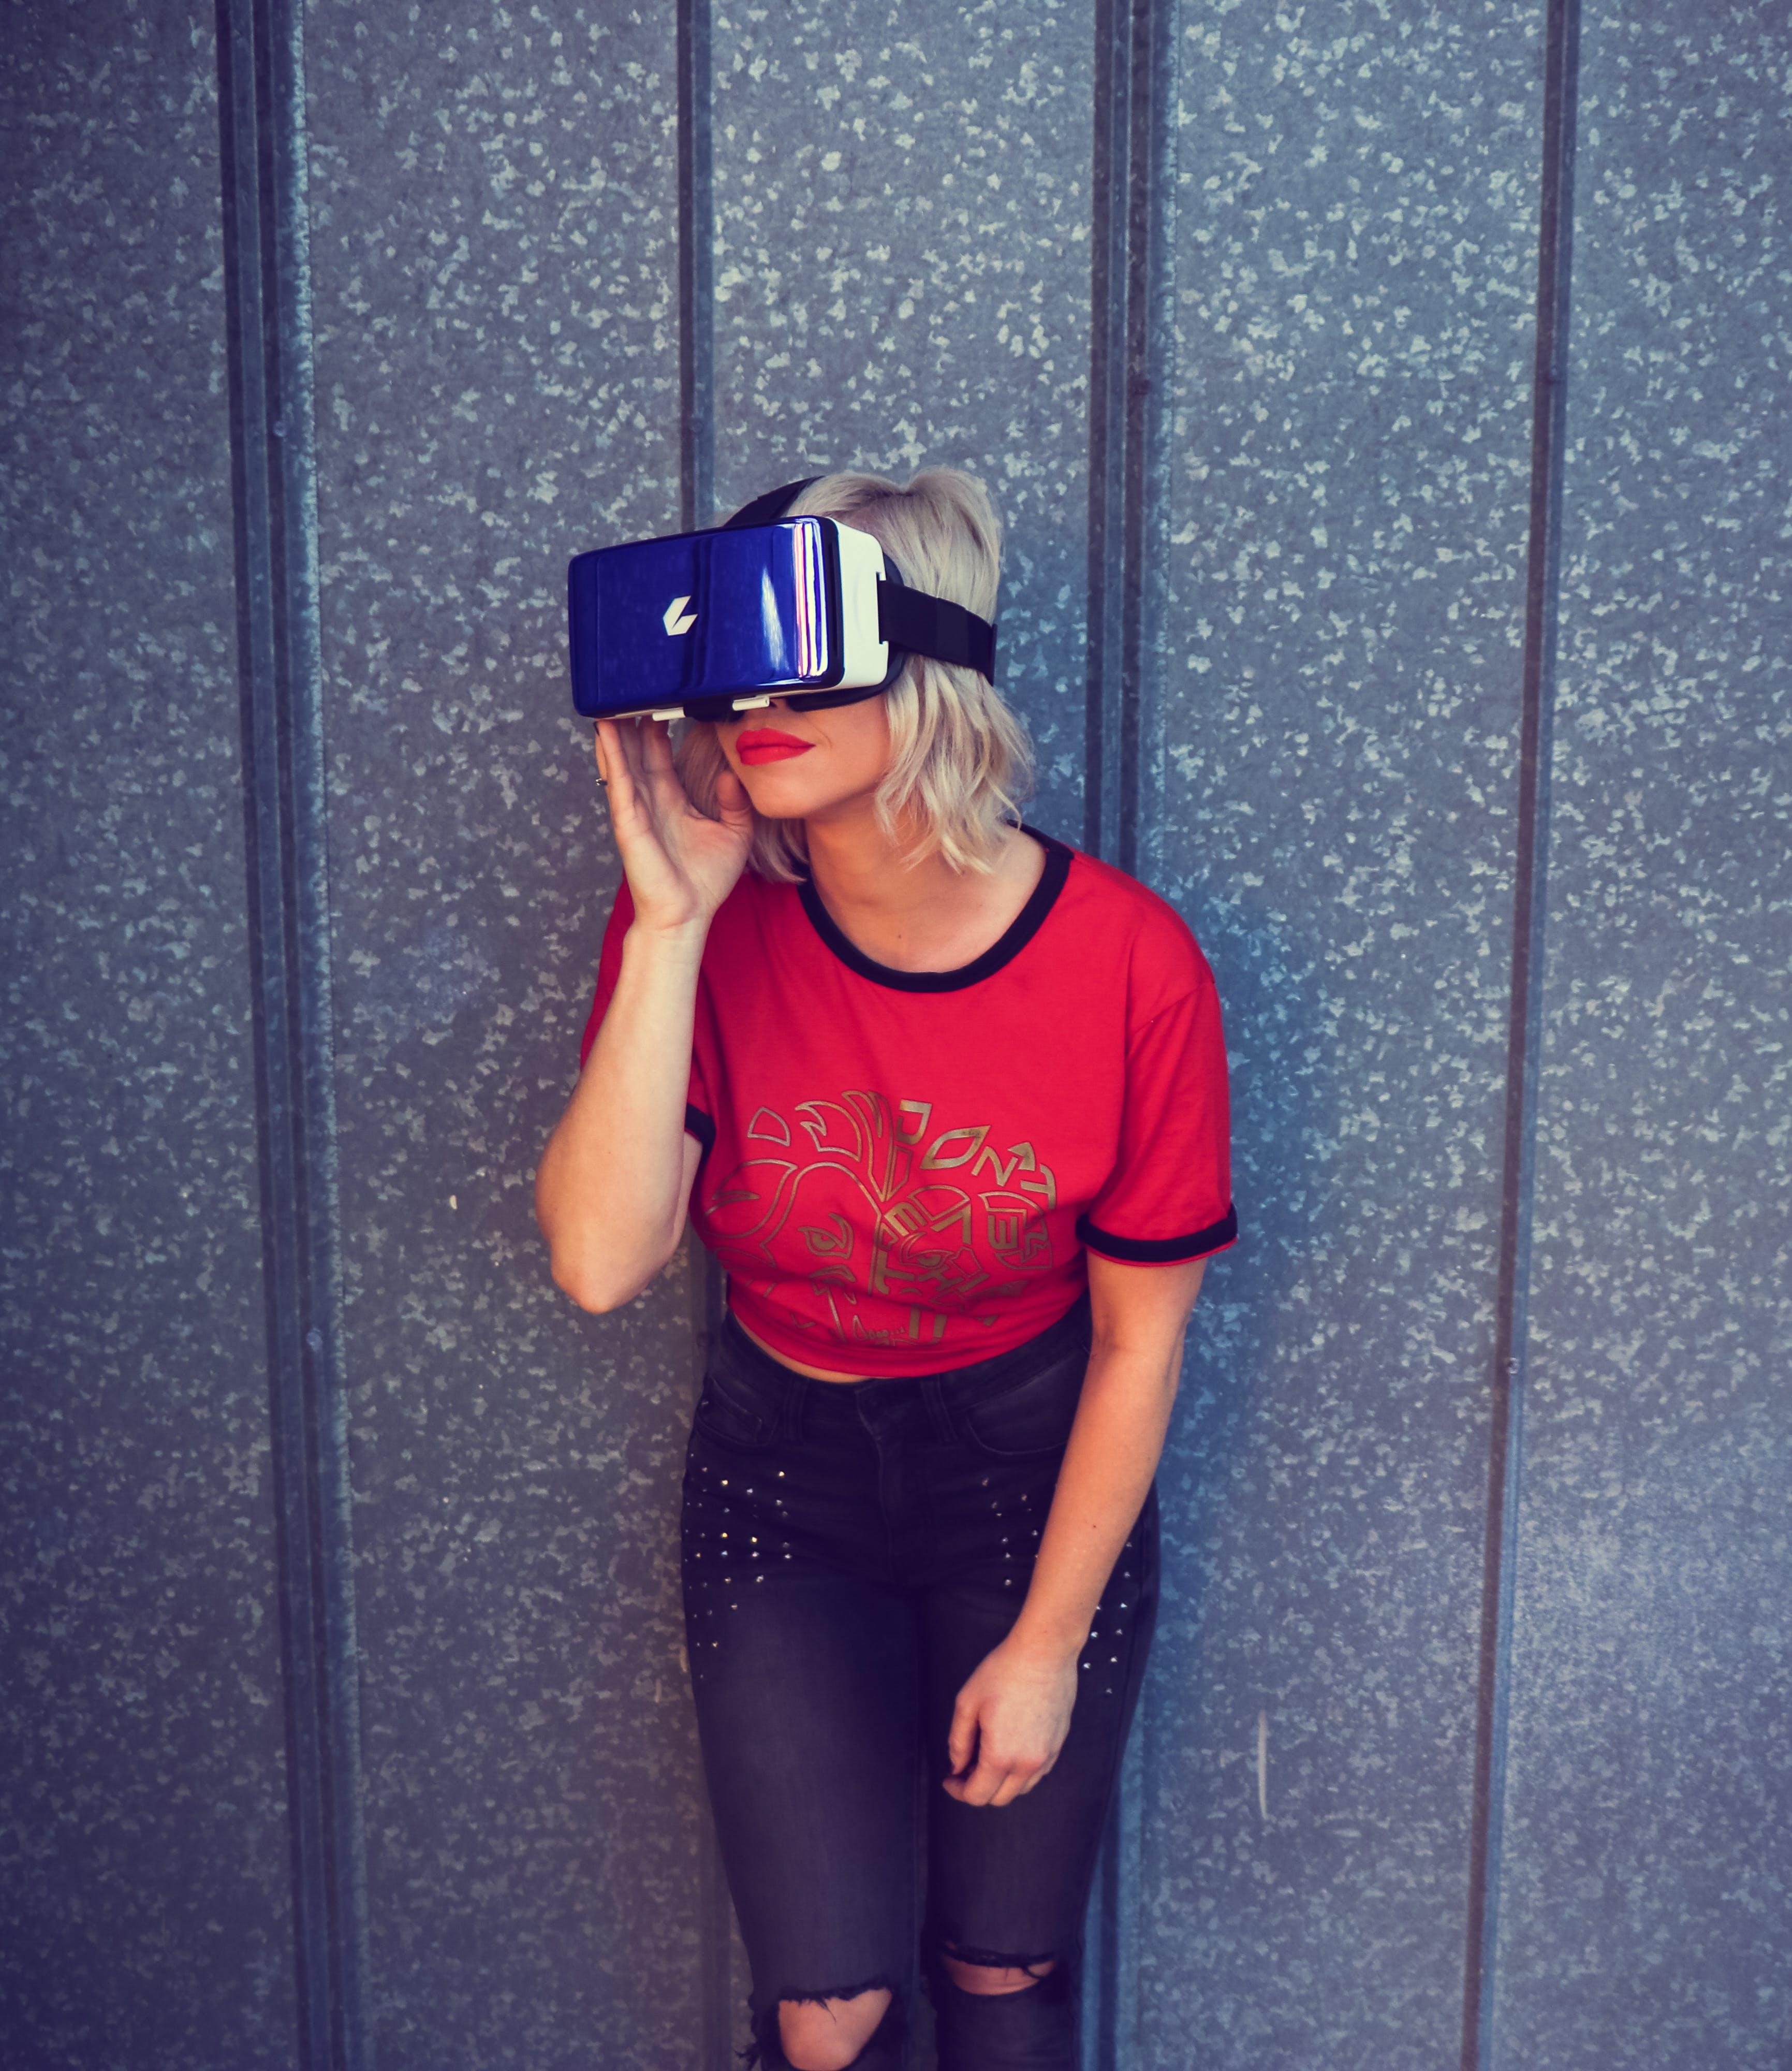 Photo of a Woman Wearing Virtual Reality Headset